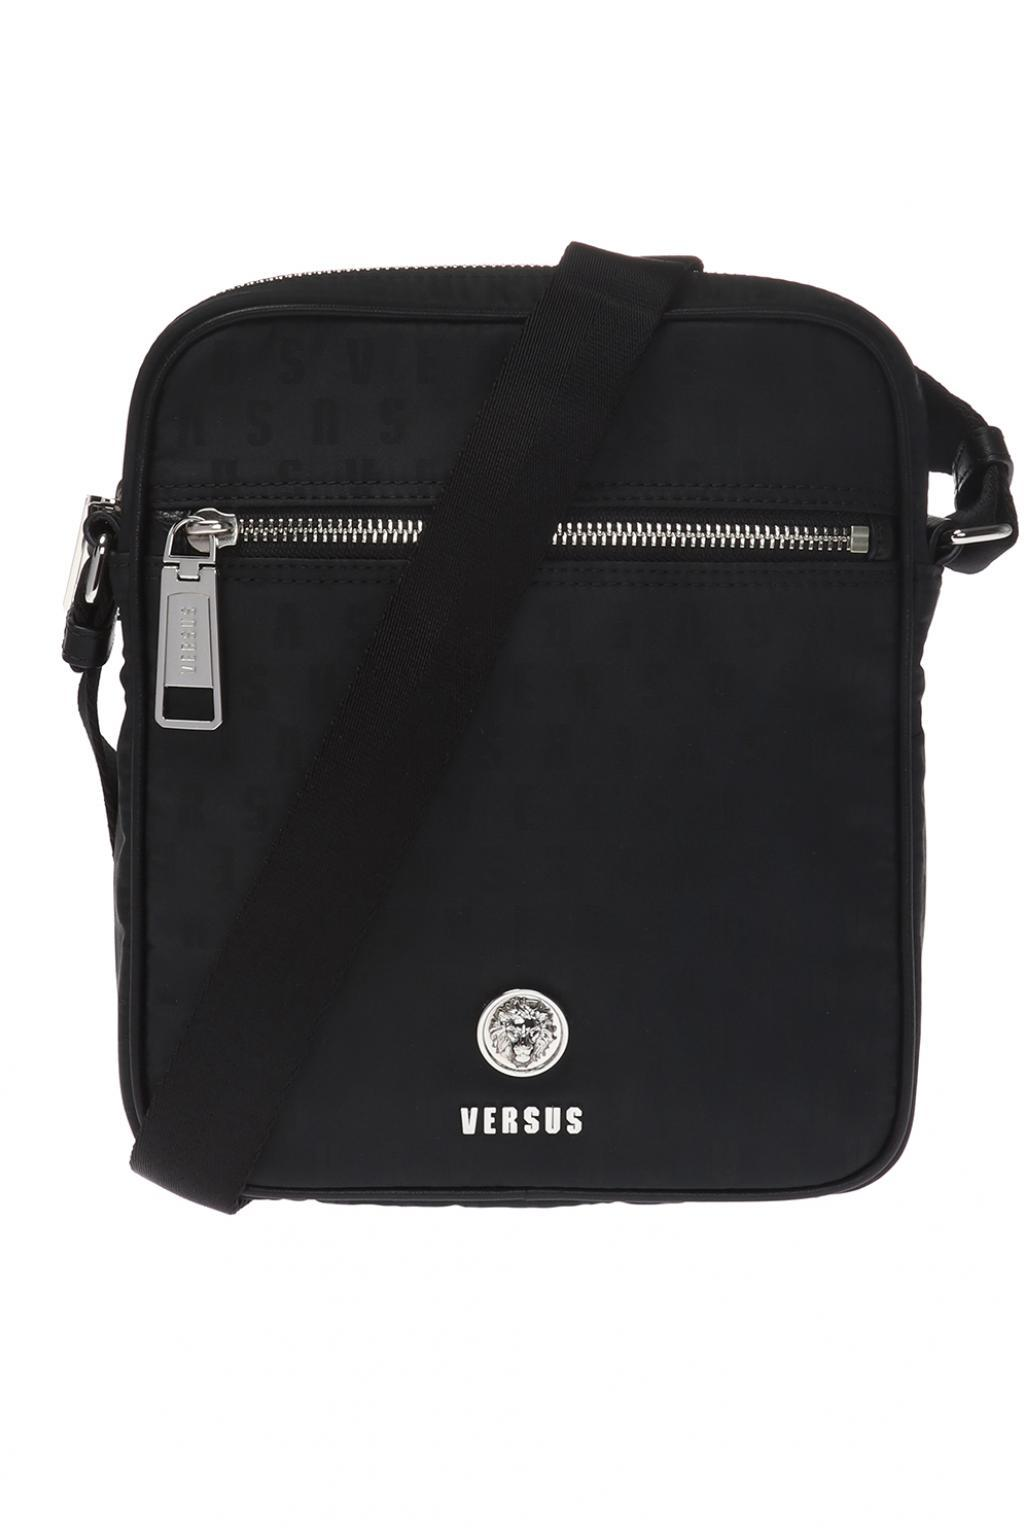 Versus - Black Logo Shoulder Bag for Men - Lyst. View fullscreen 22068f460810e